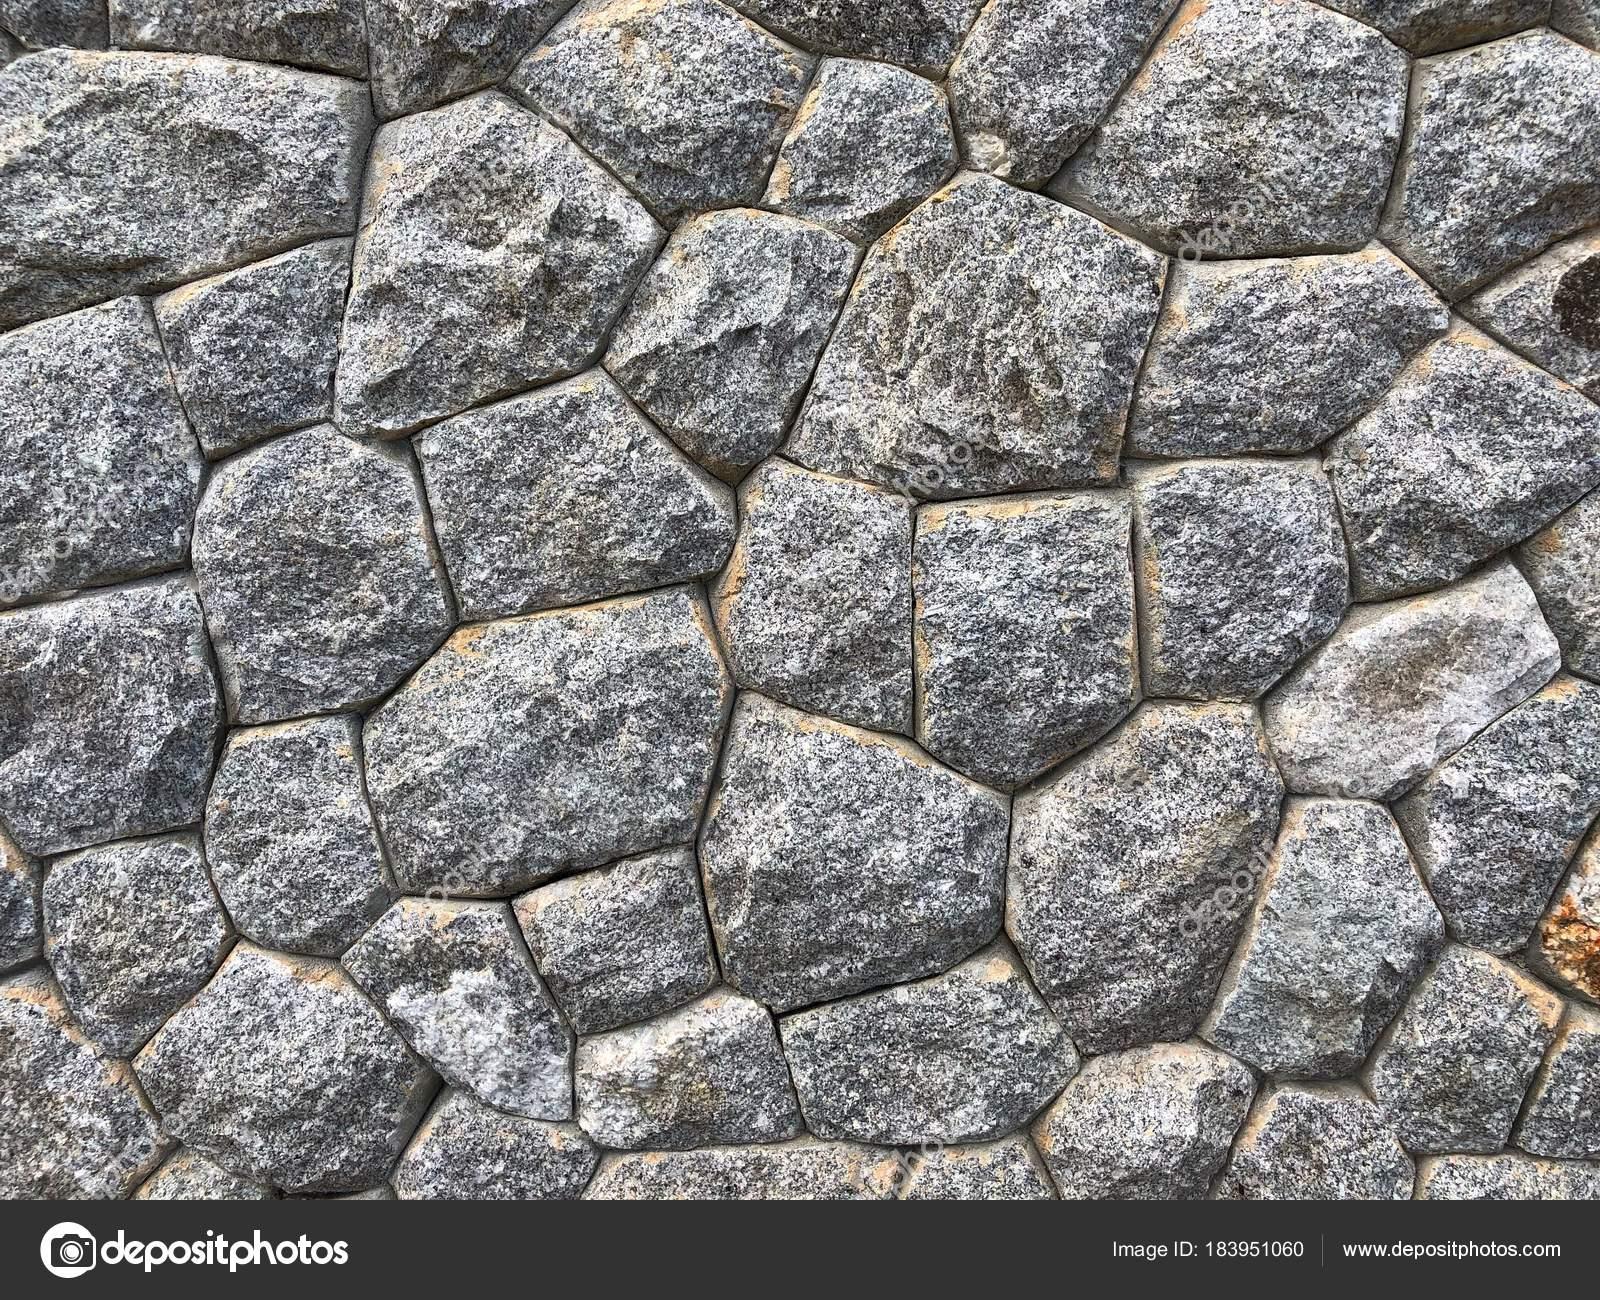 muro piedra como textura fondo foto de stock - Muro De Piedra